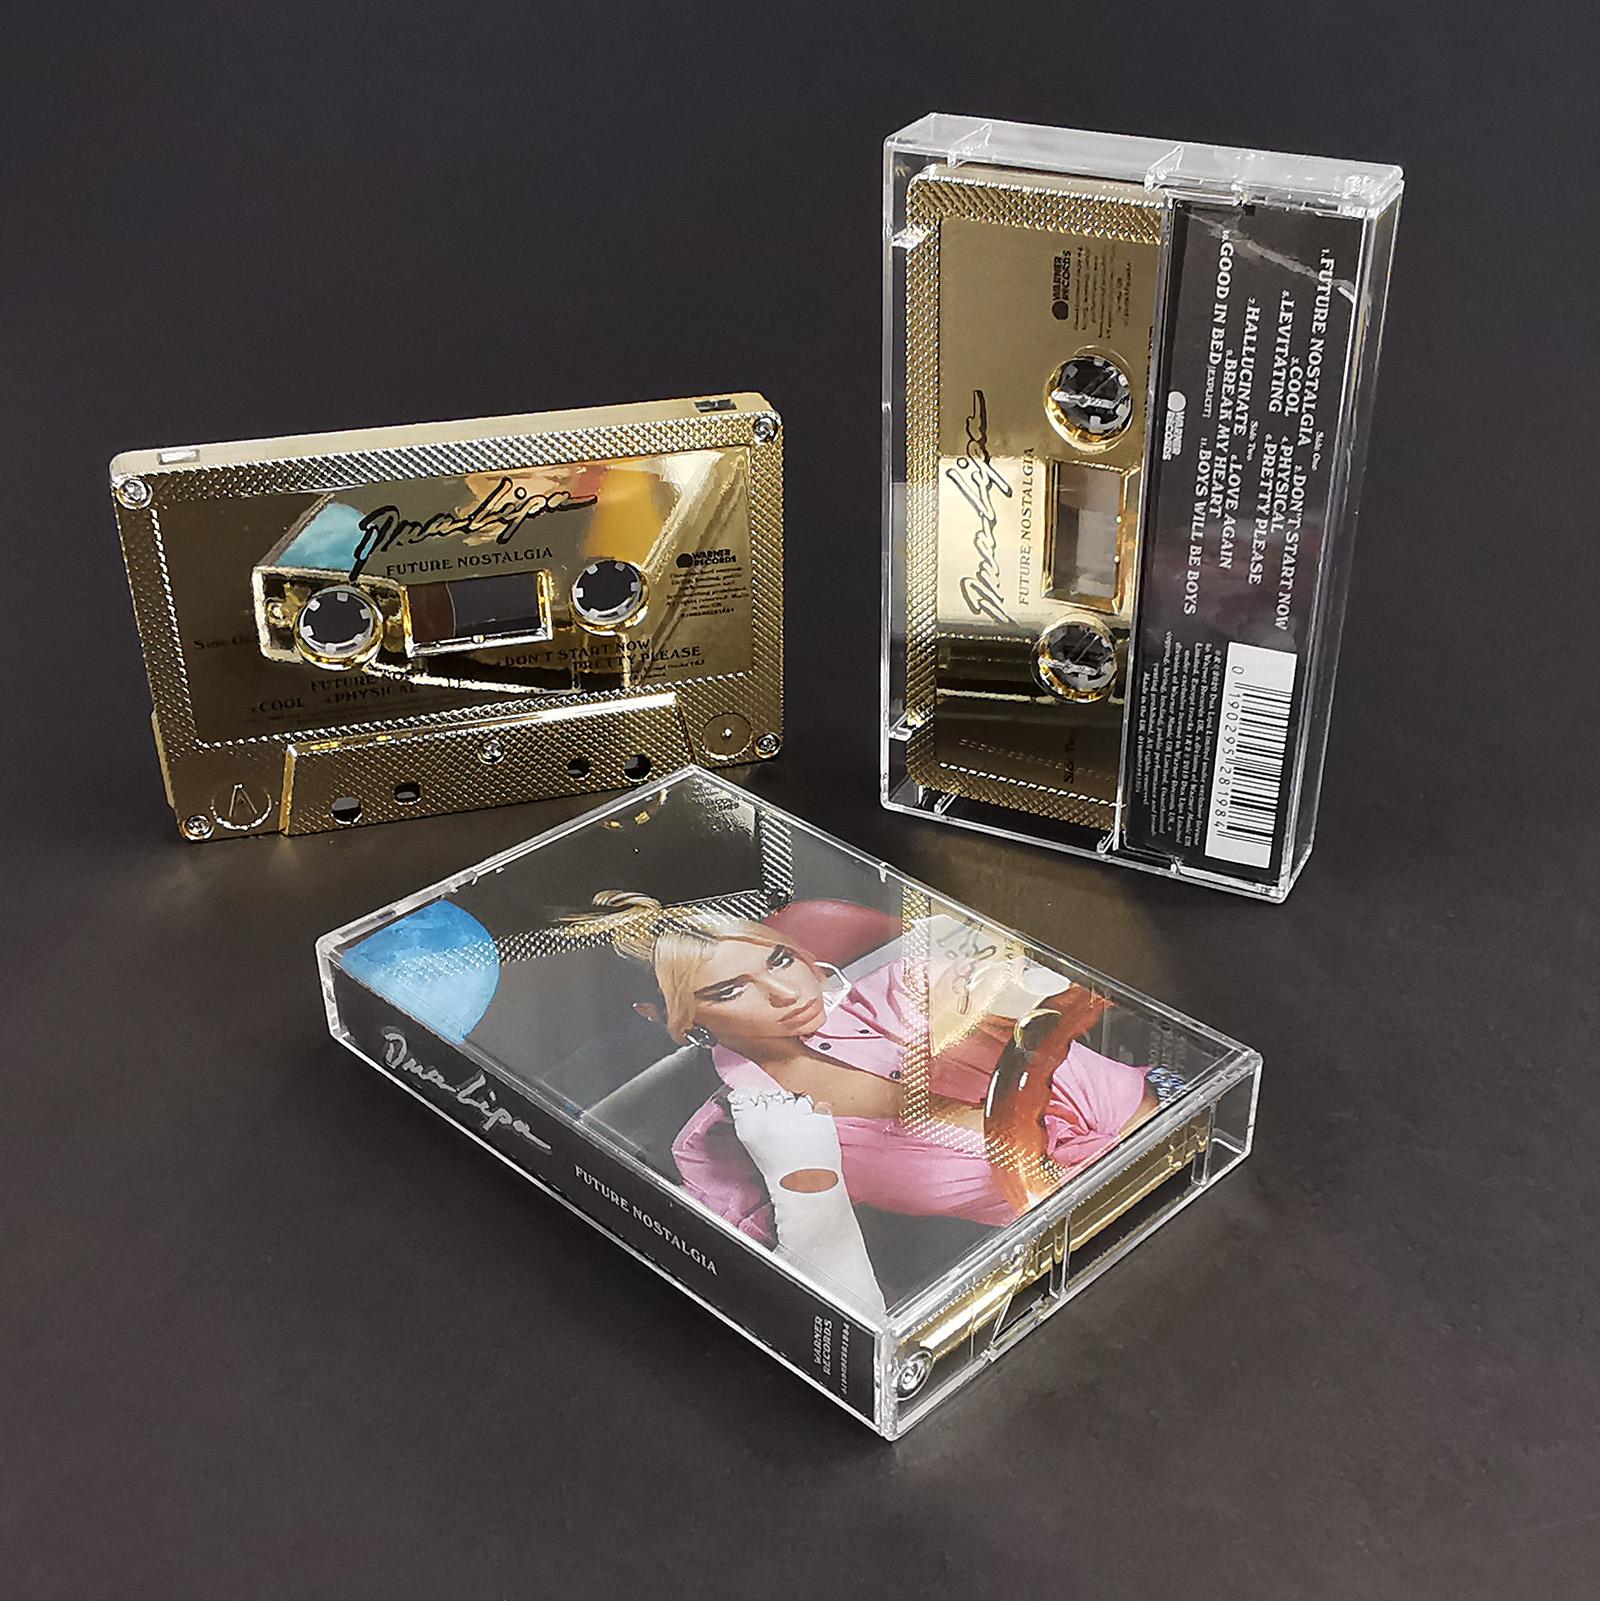 Dua Lipa Future Nostalgia mirror gold cassette tapes with on-body printing